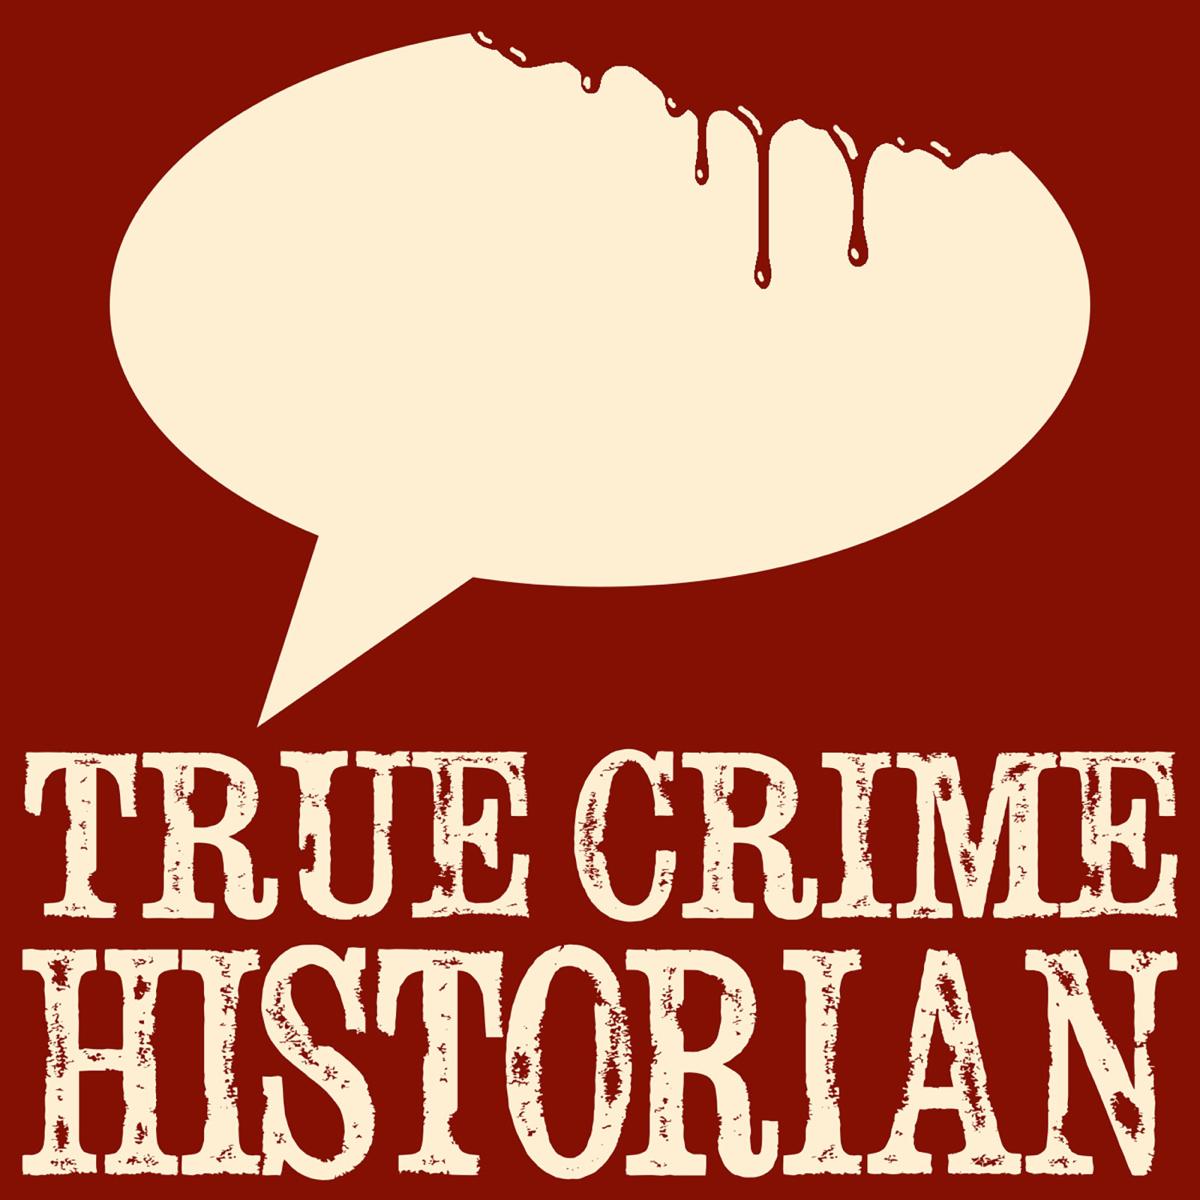 Best episodes of True Crime Historian | Podyssey Podcasts